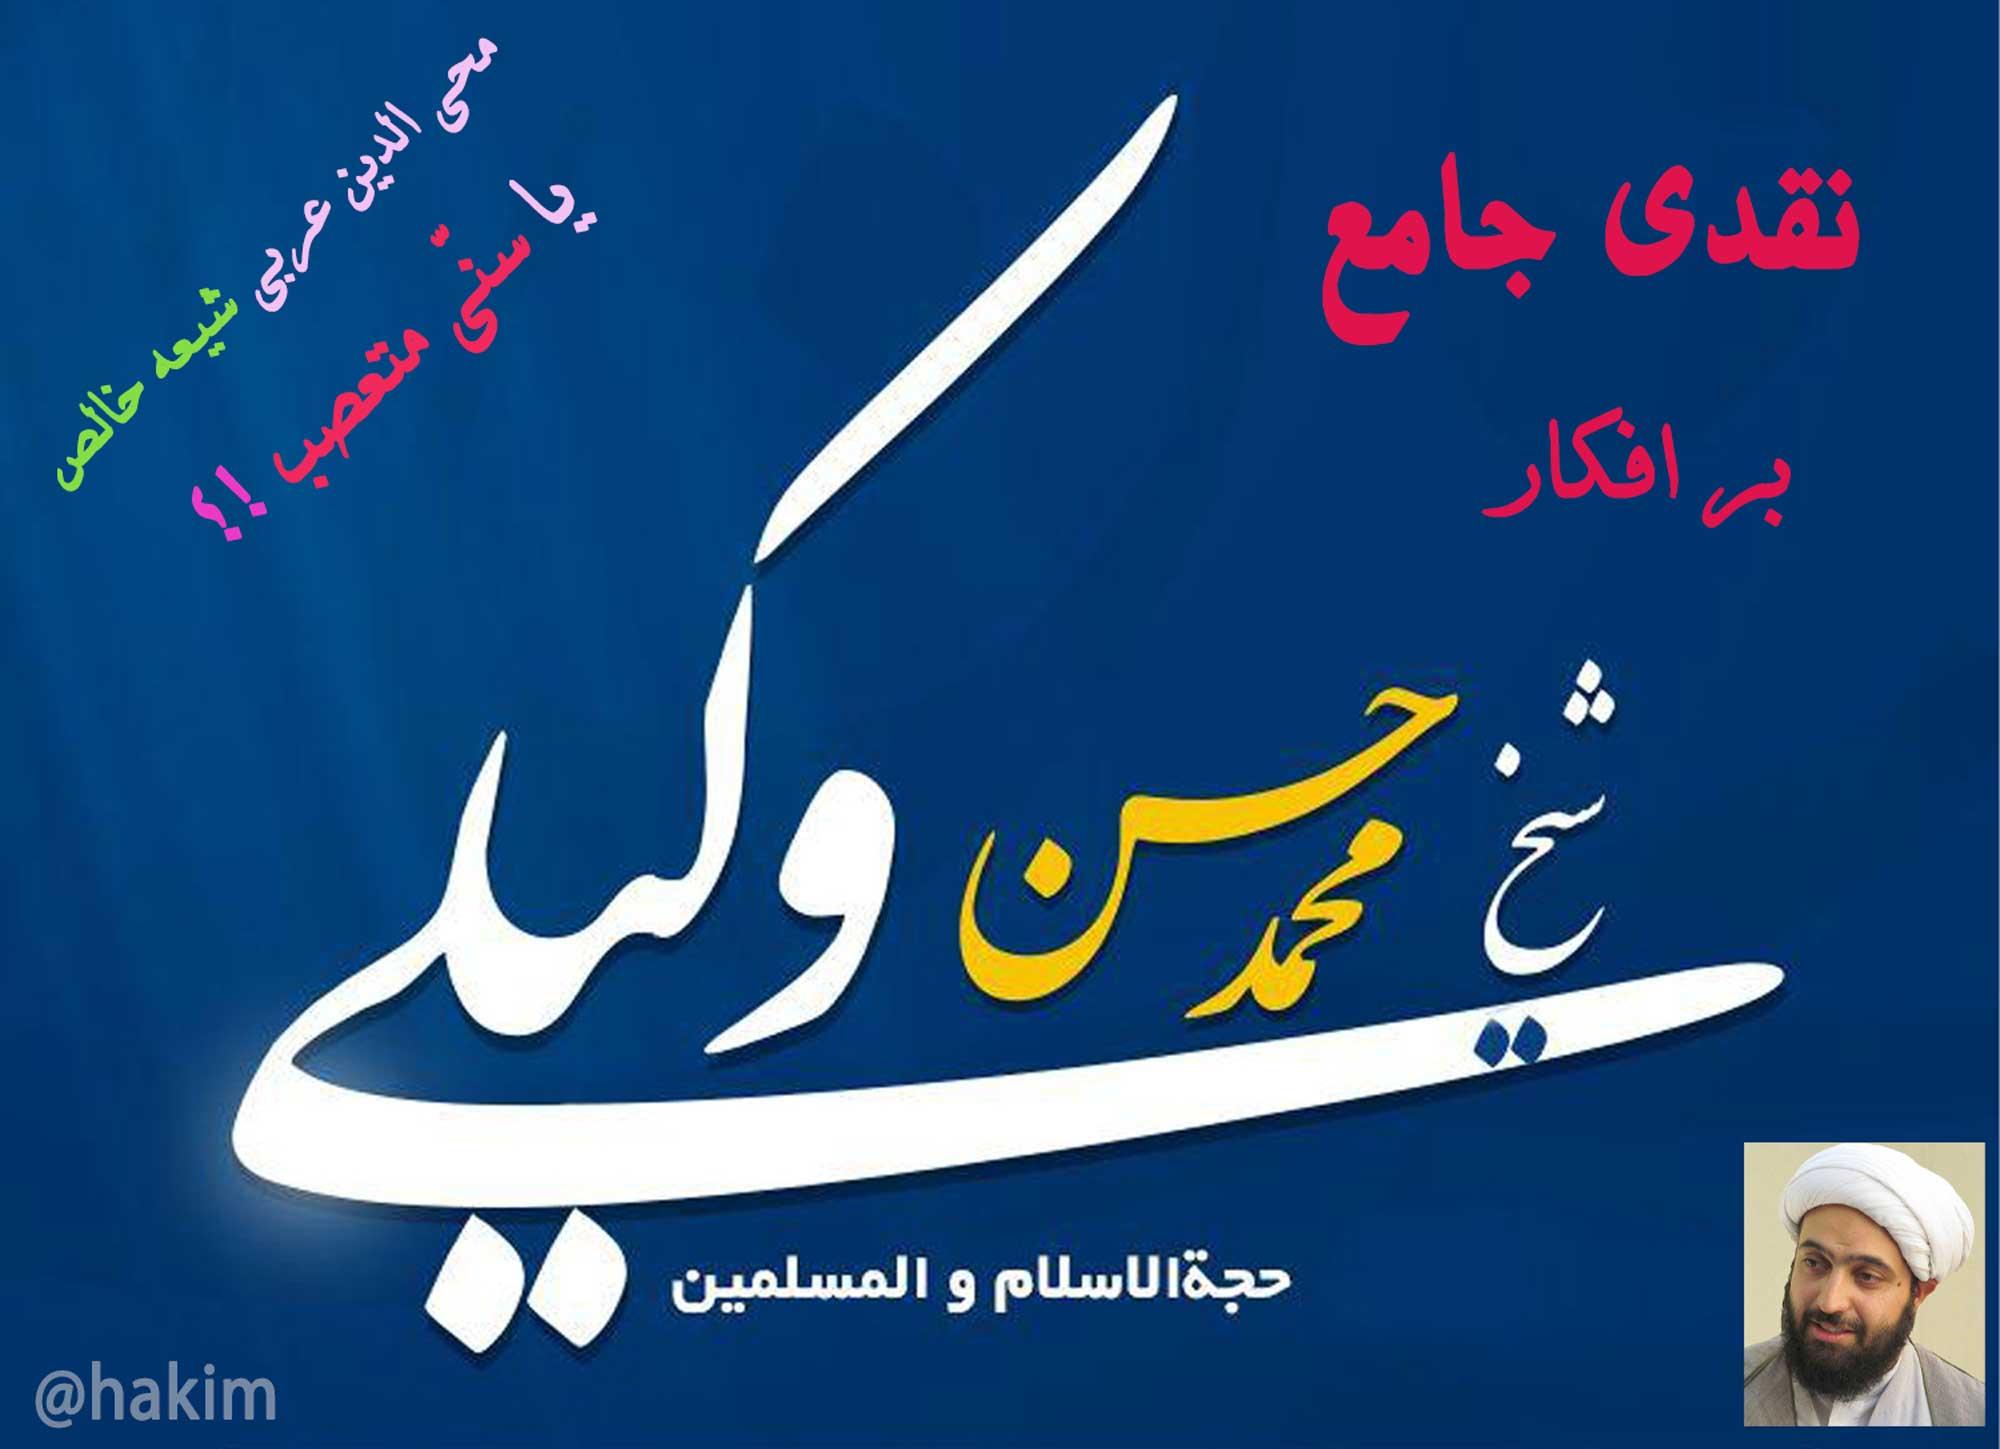 محی الدین عربی شیعه خالص یا سنی متعصب